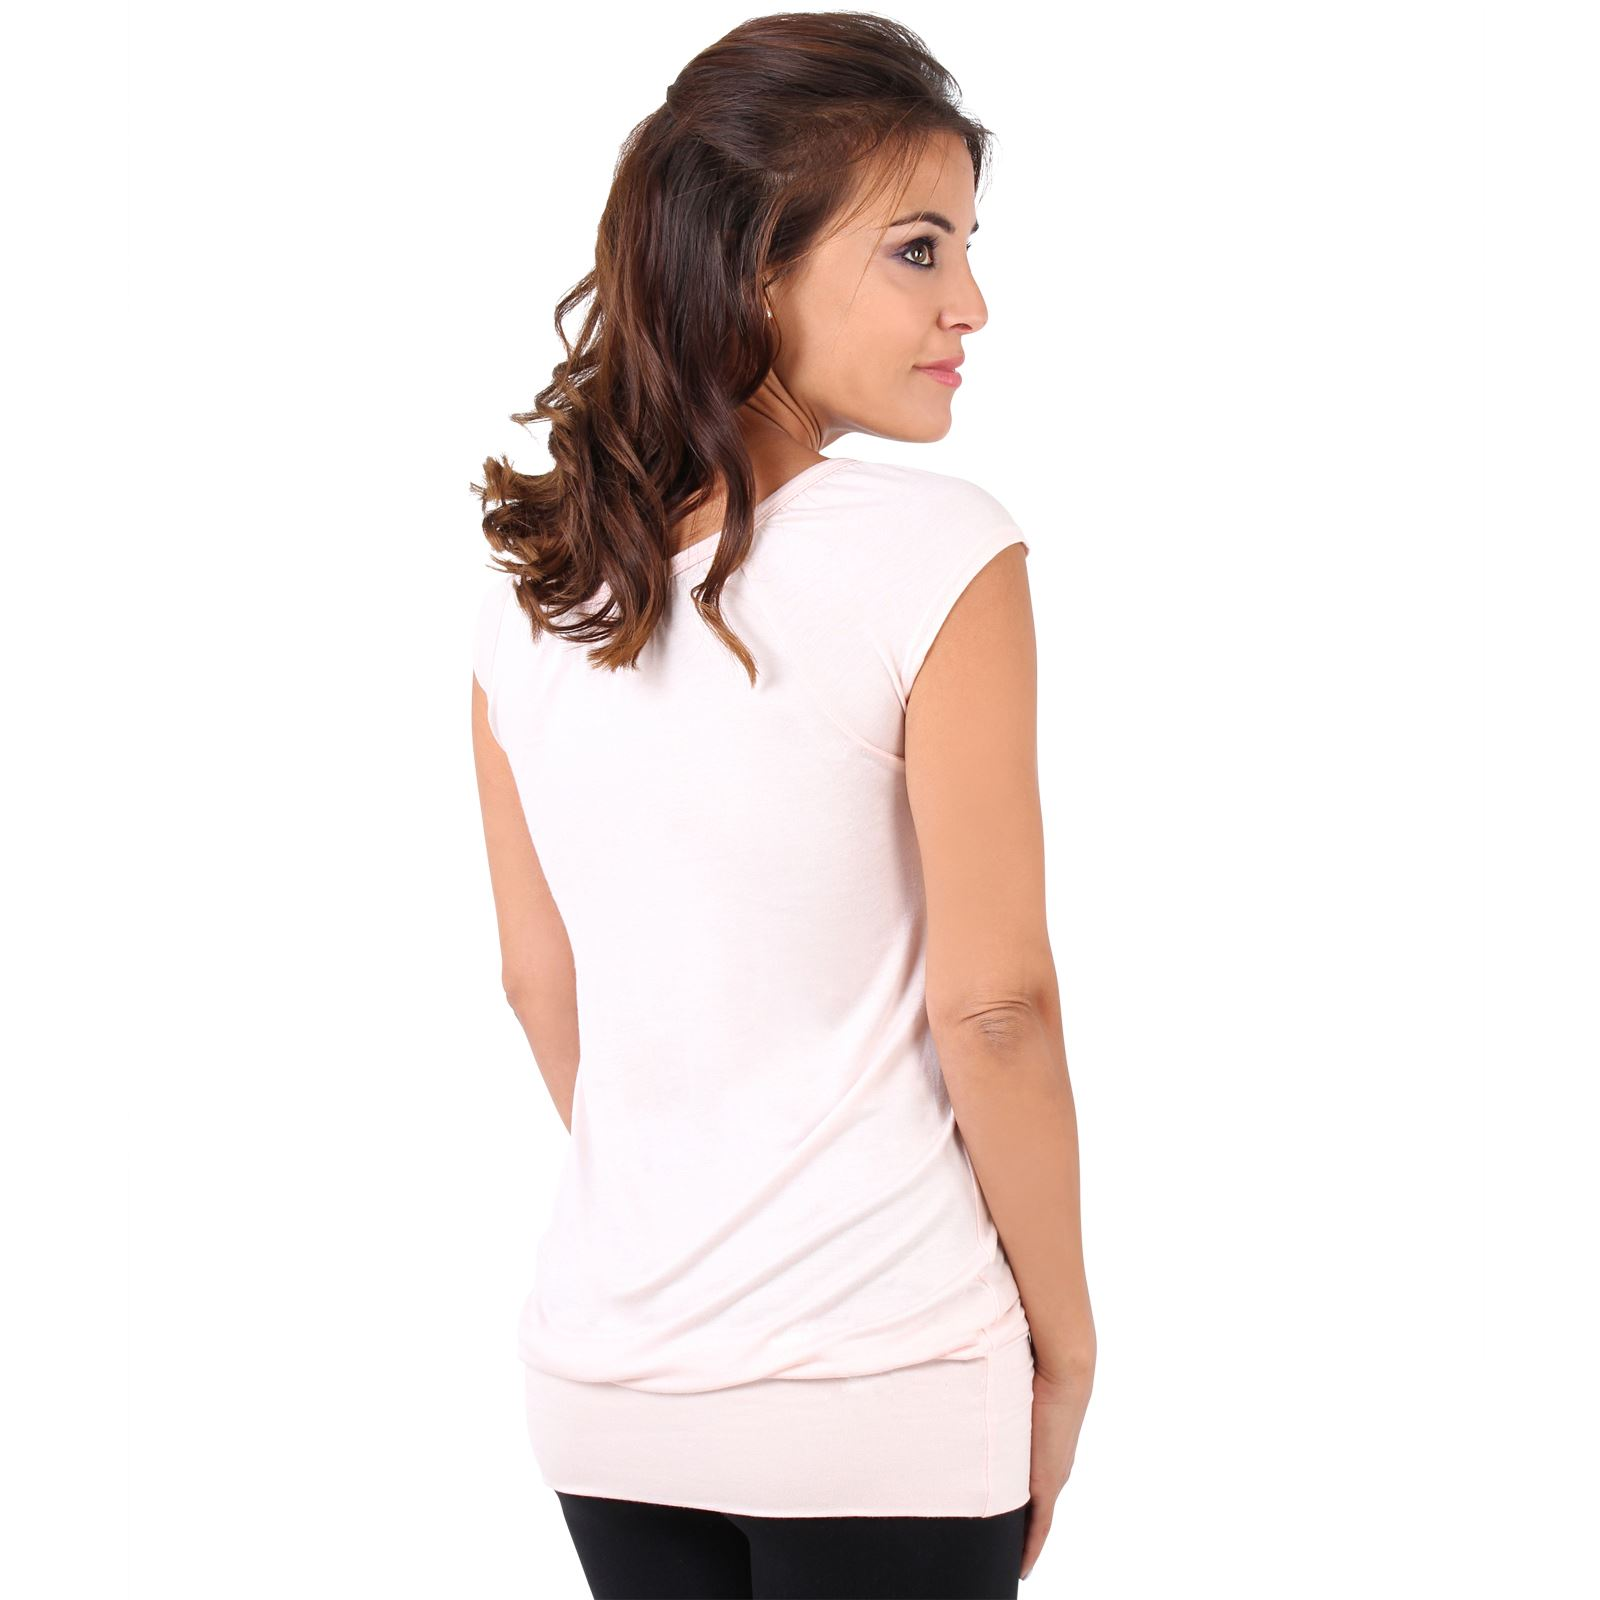 Womens-Ladies-Plain-T-Shirt-Short-Sleeve-Long-Loose-V-Neck-Blouse-Tunic-Top thumbnail 40